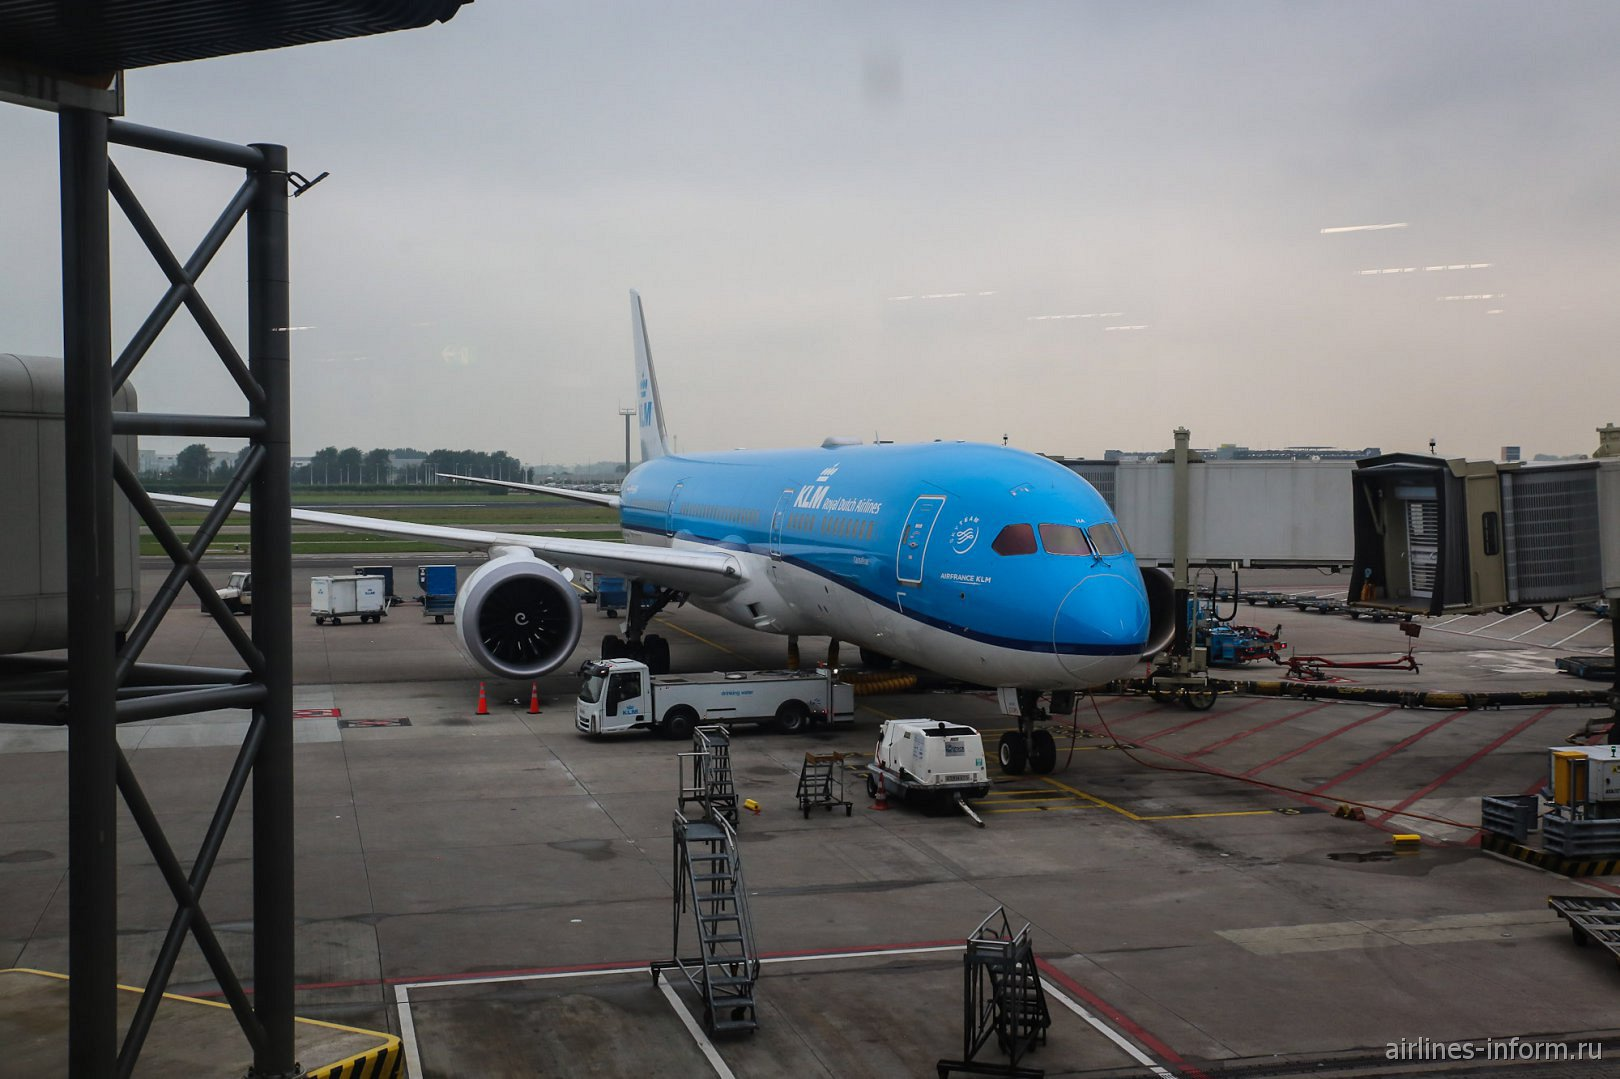 Боинг-787-9 авиакомпании KLM в аэропорту Амстердама